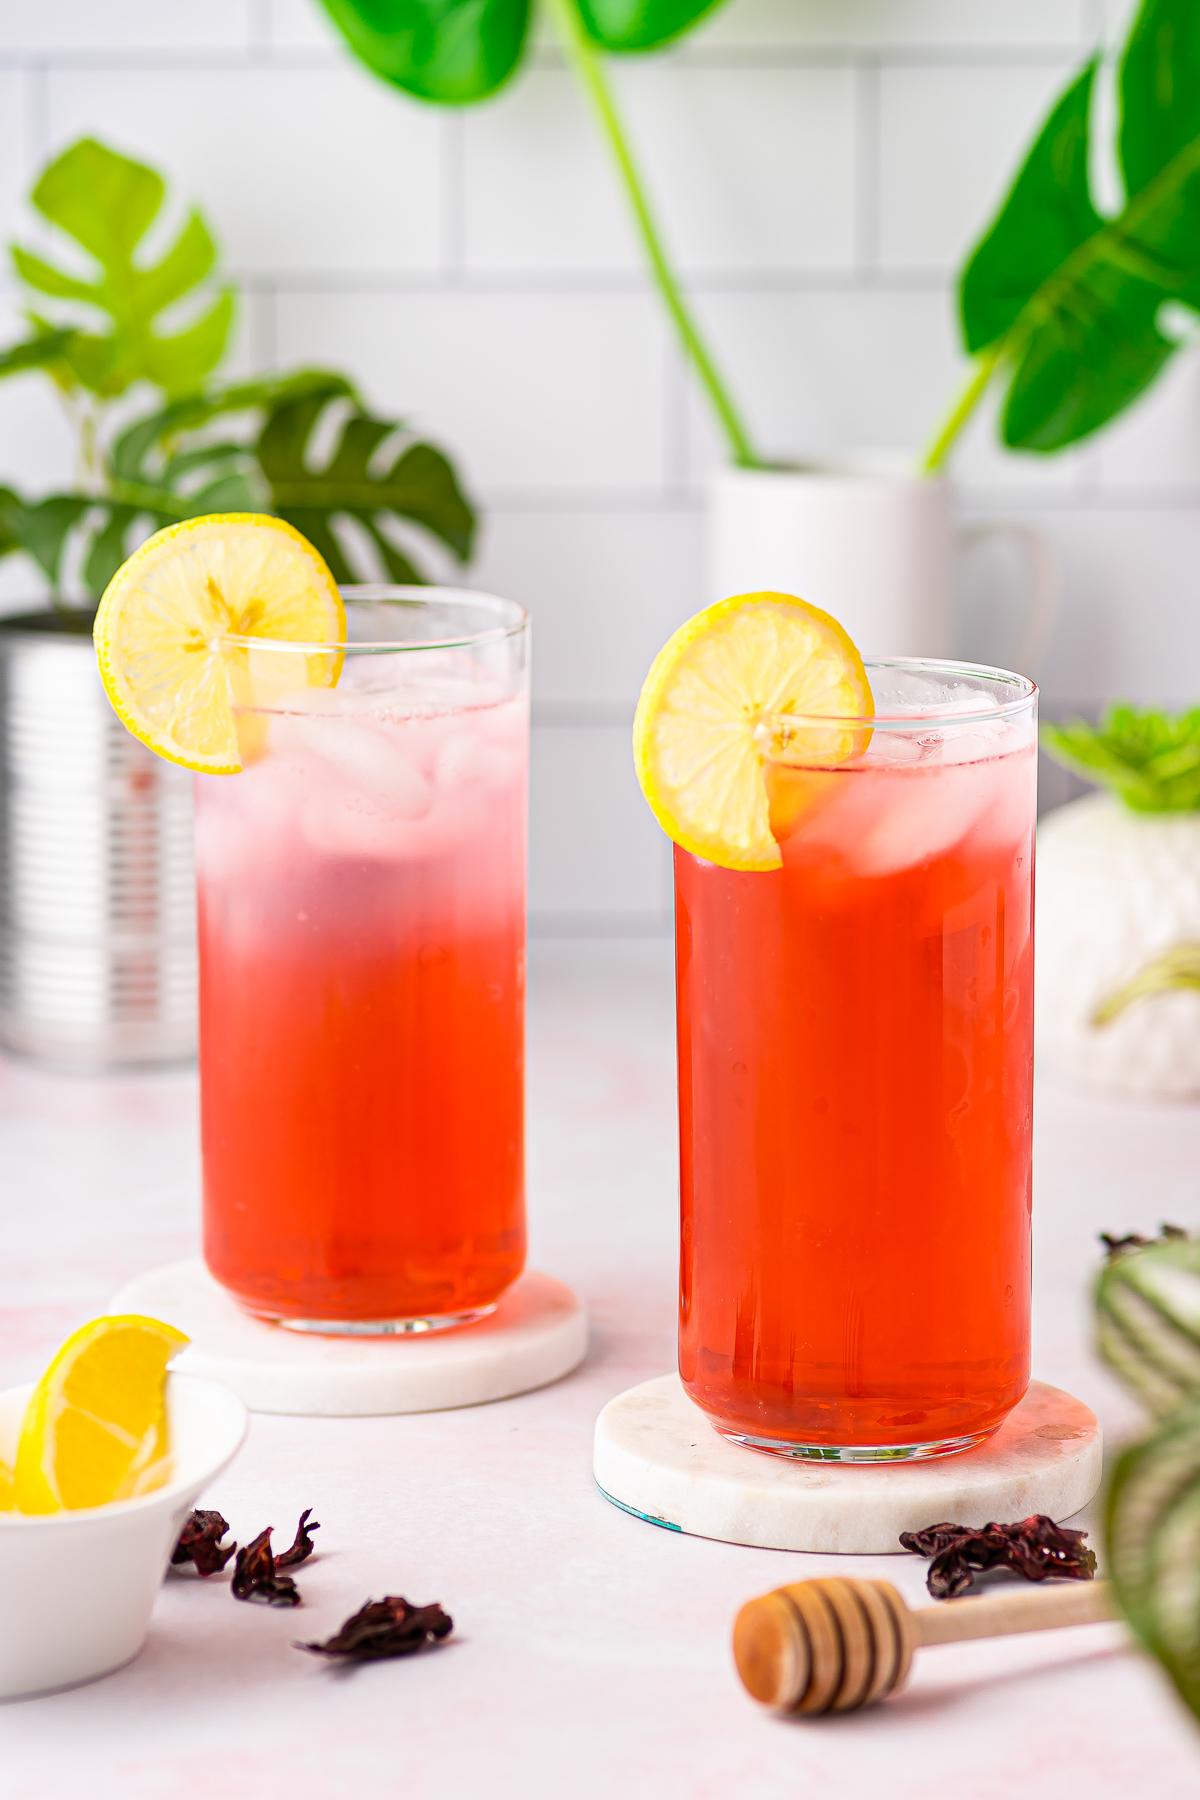 Two glasses garnished with lemon full of tea